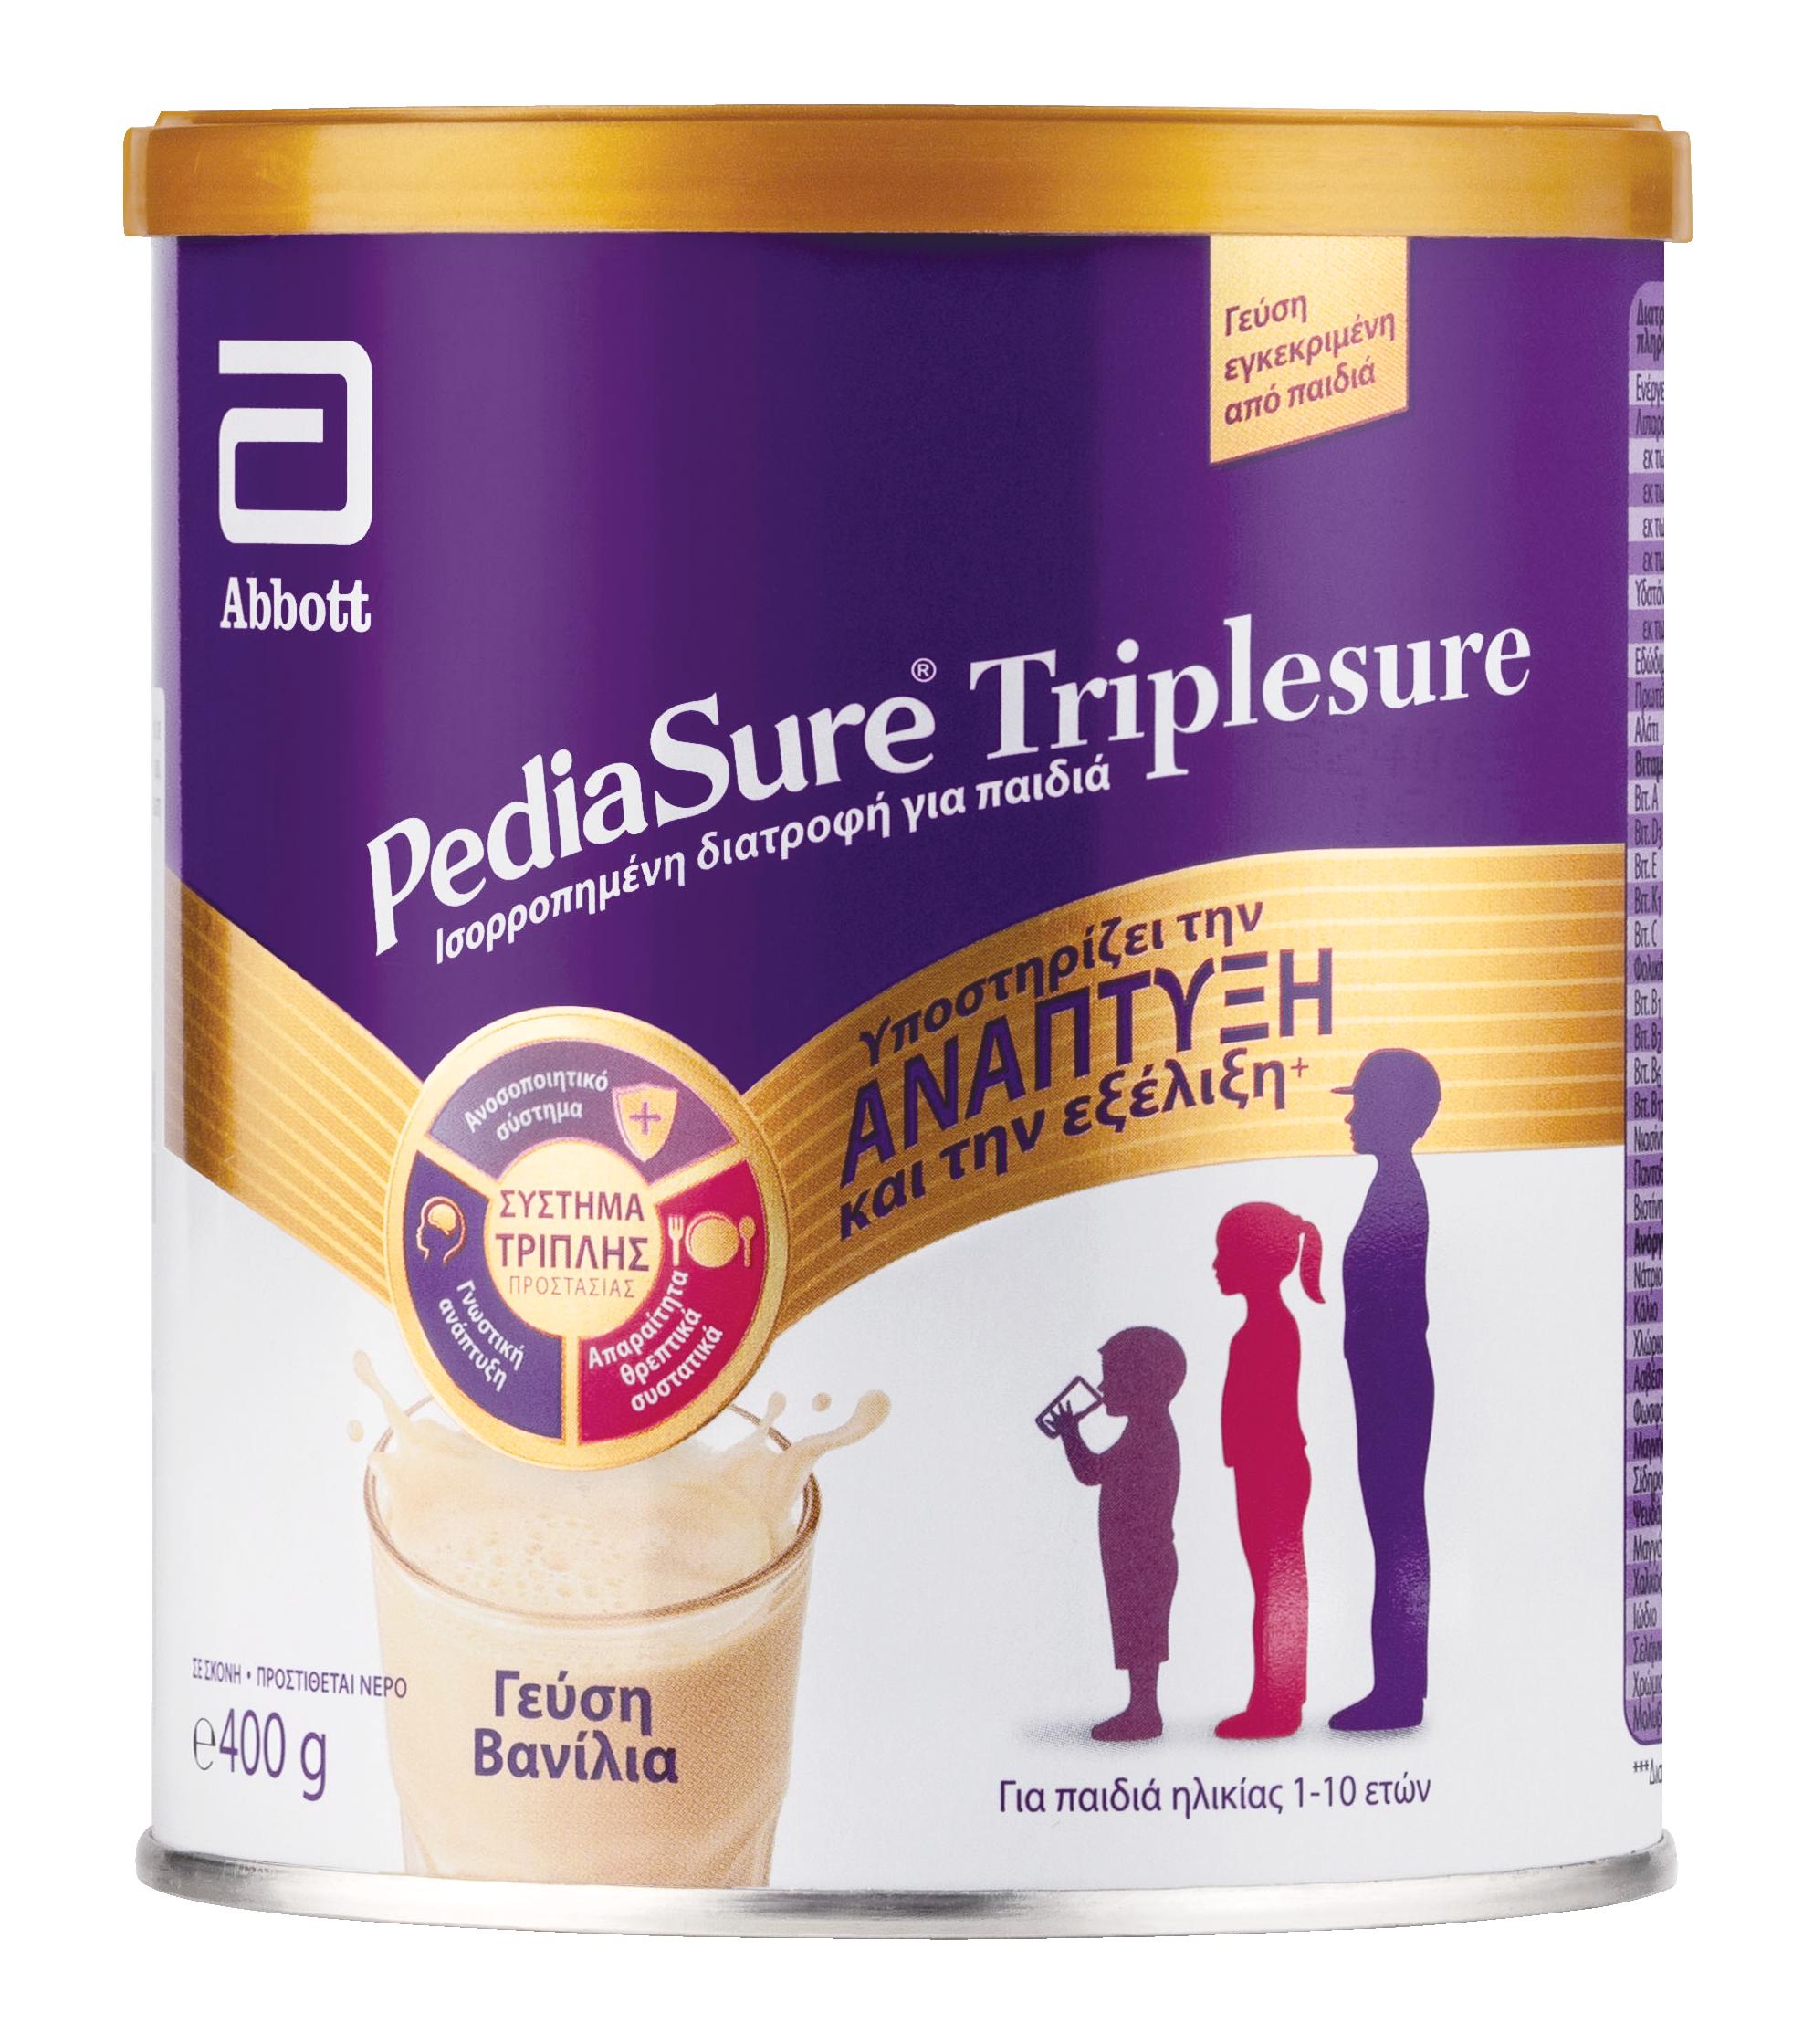 To Pediasure TripleSure αποτελεί ένα συμπλήρωμα διατροφής για παιδιά ηλικίας από 1 έως 10 ετών, με πιθανώς ανεπαρκή πρόσληψη θρεπτικών ουσιών.